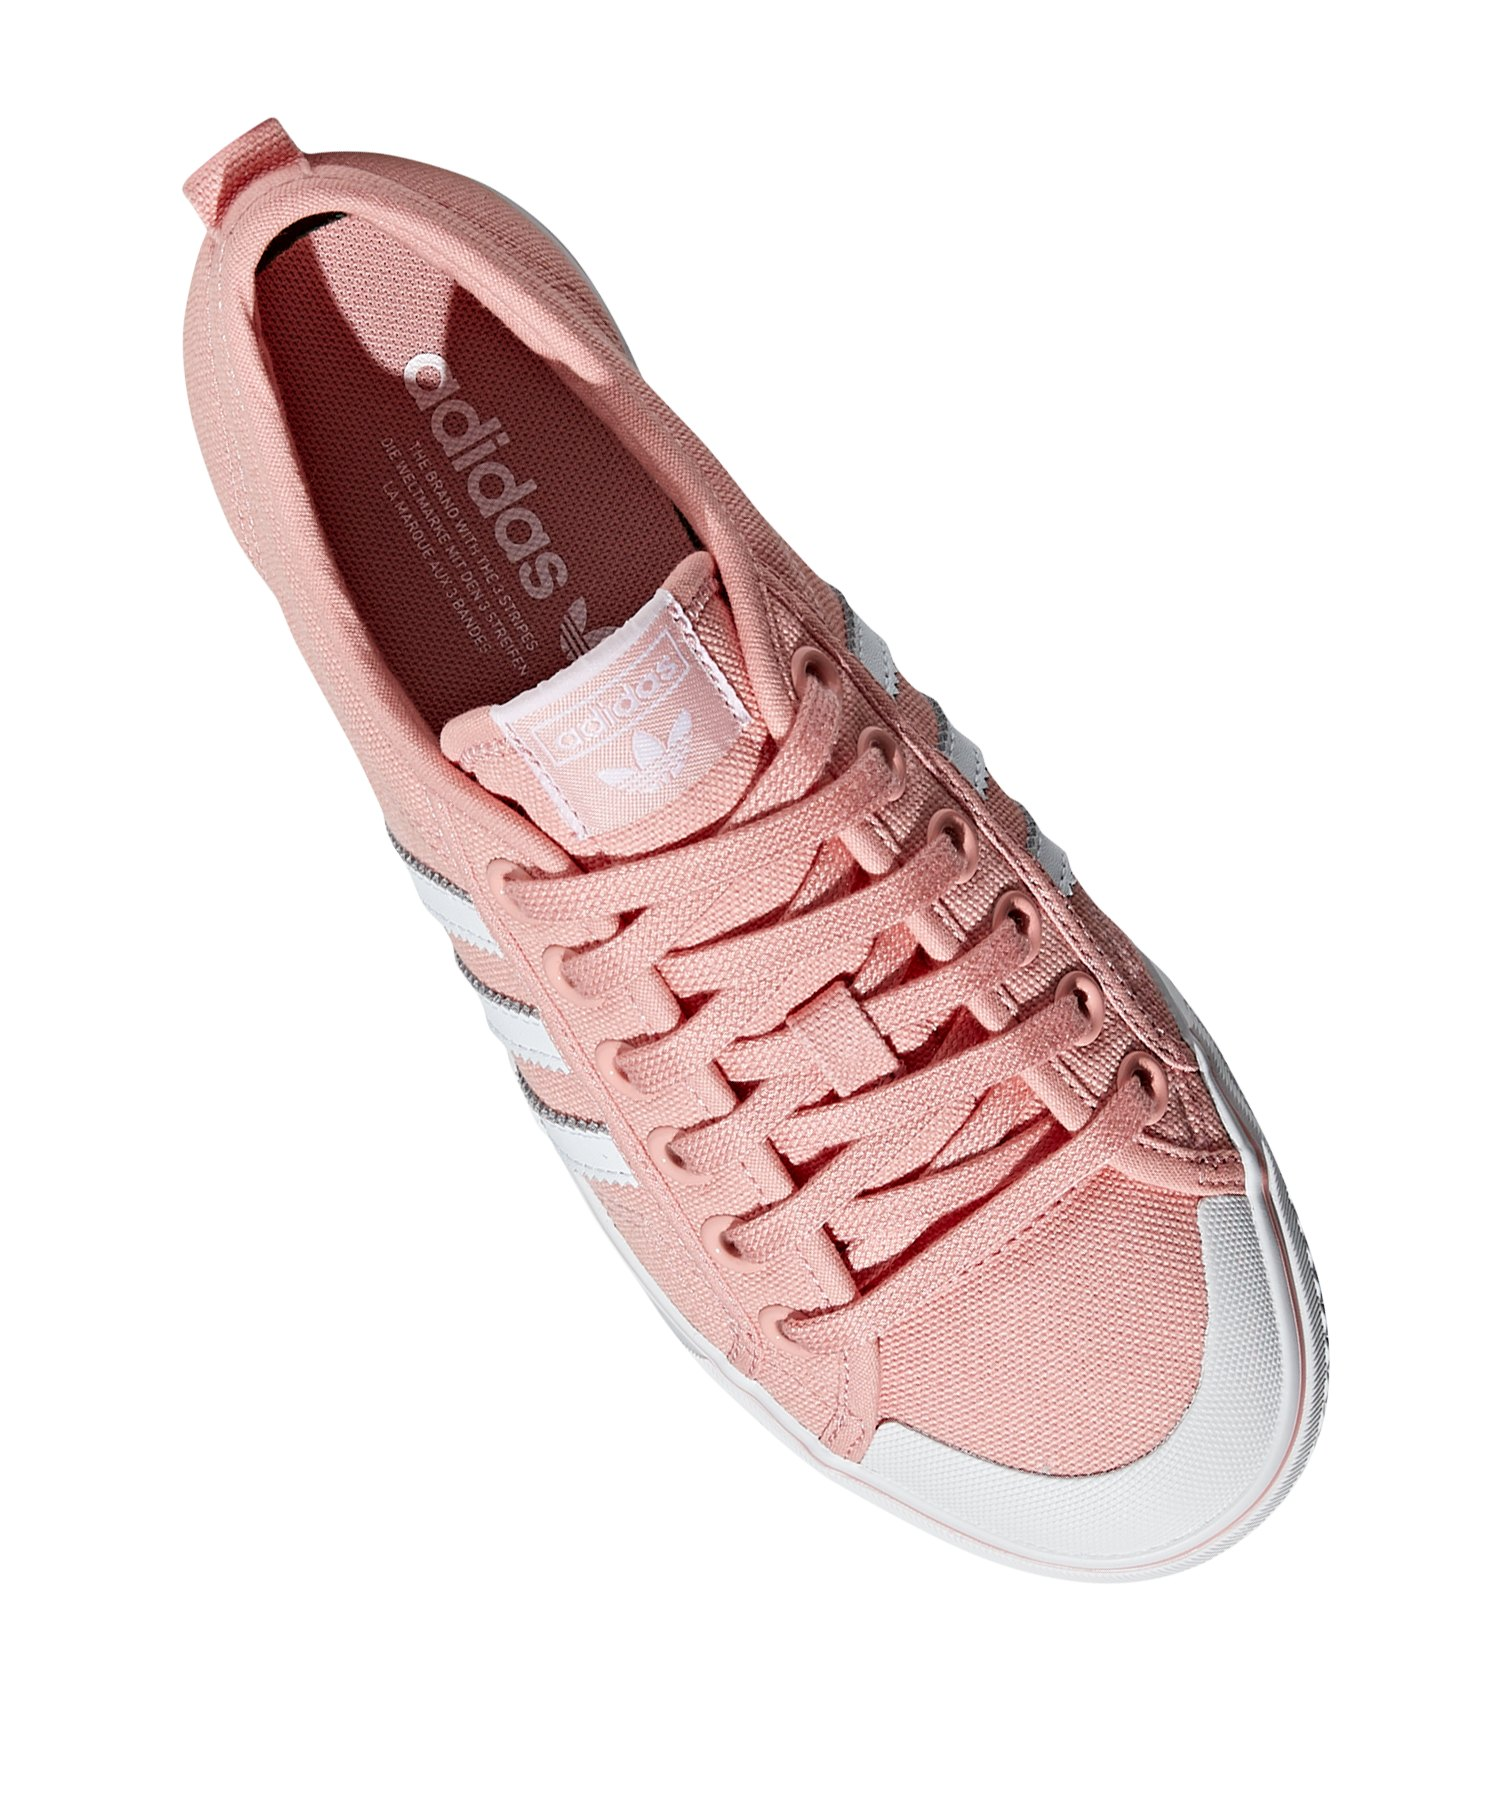 adidas Originals Nizza Sneaker Damen Rosa Weiss